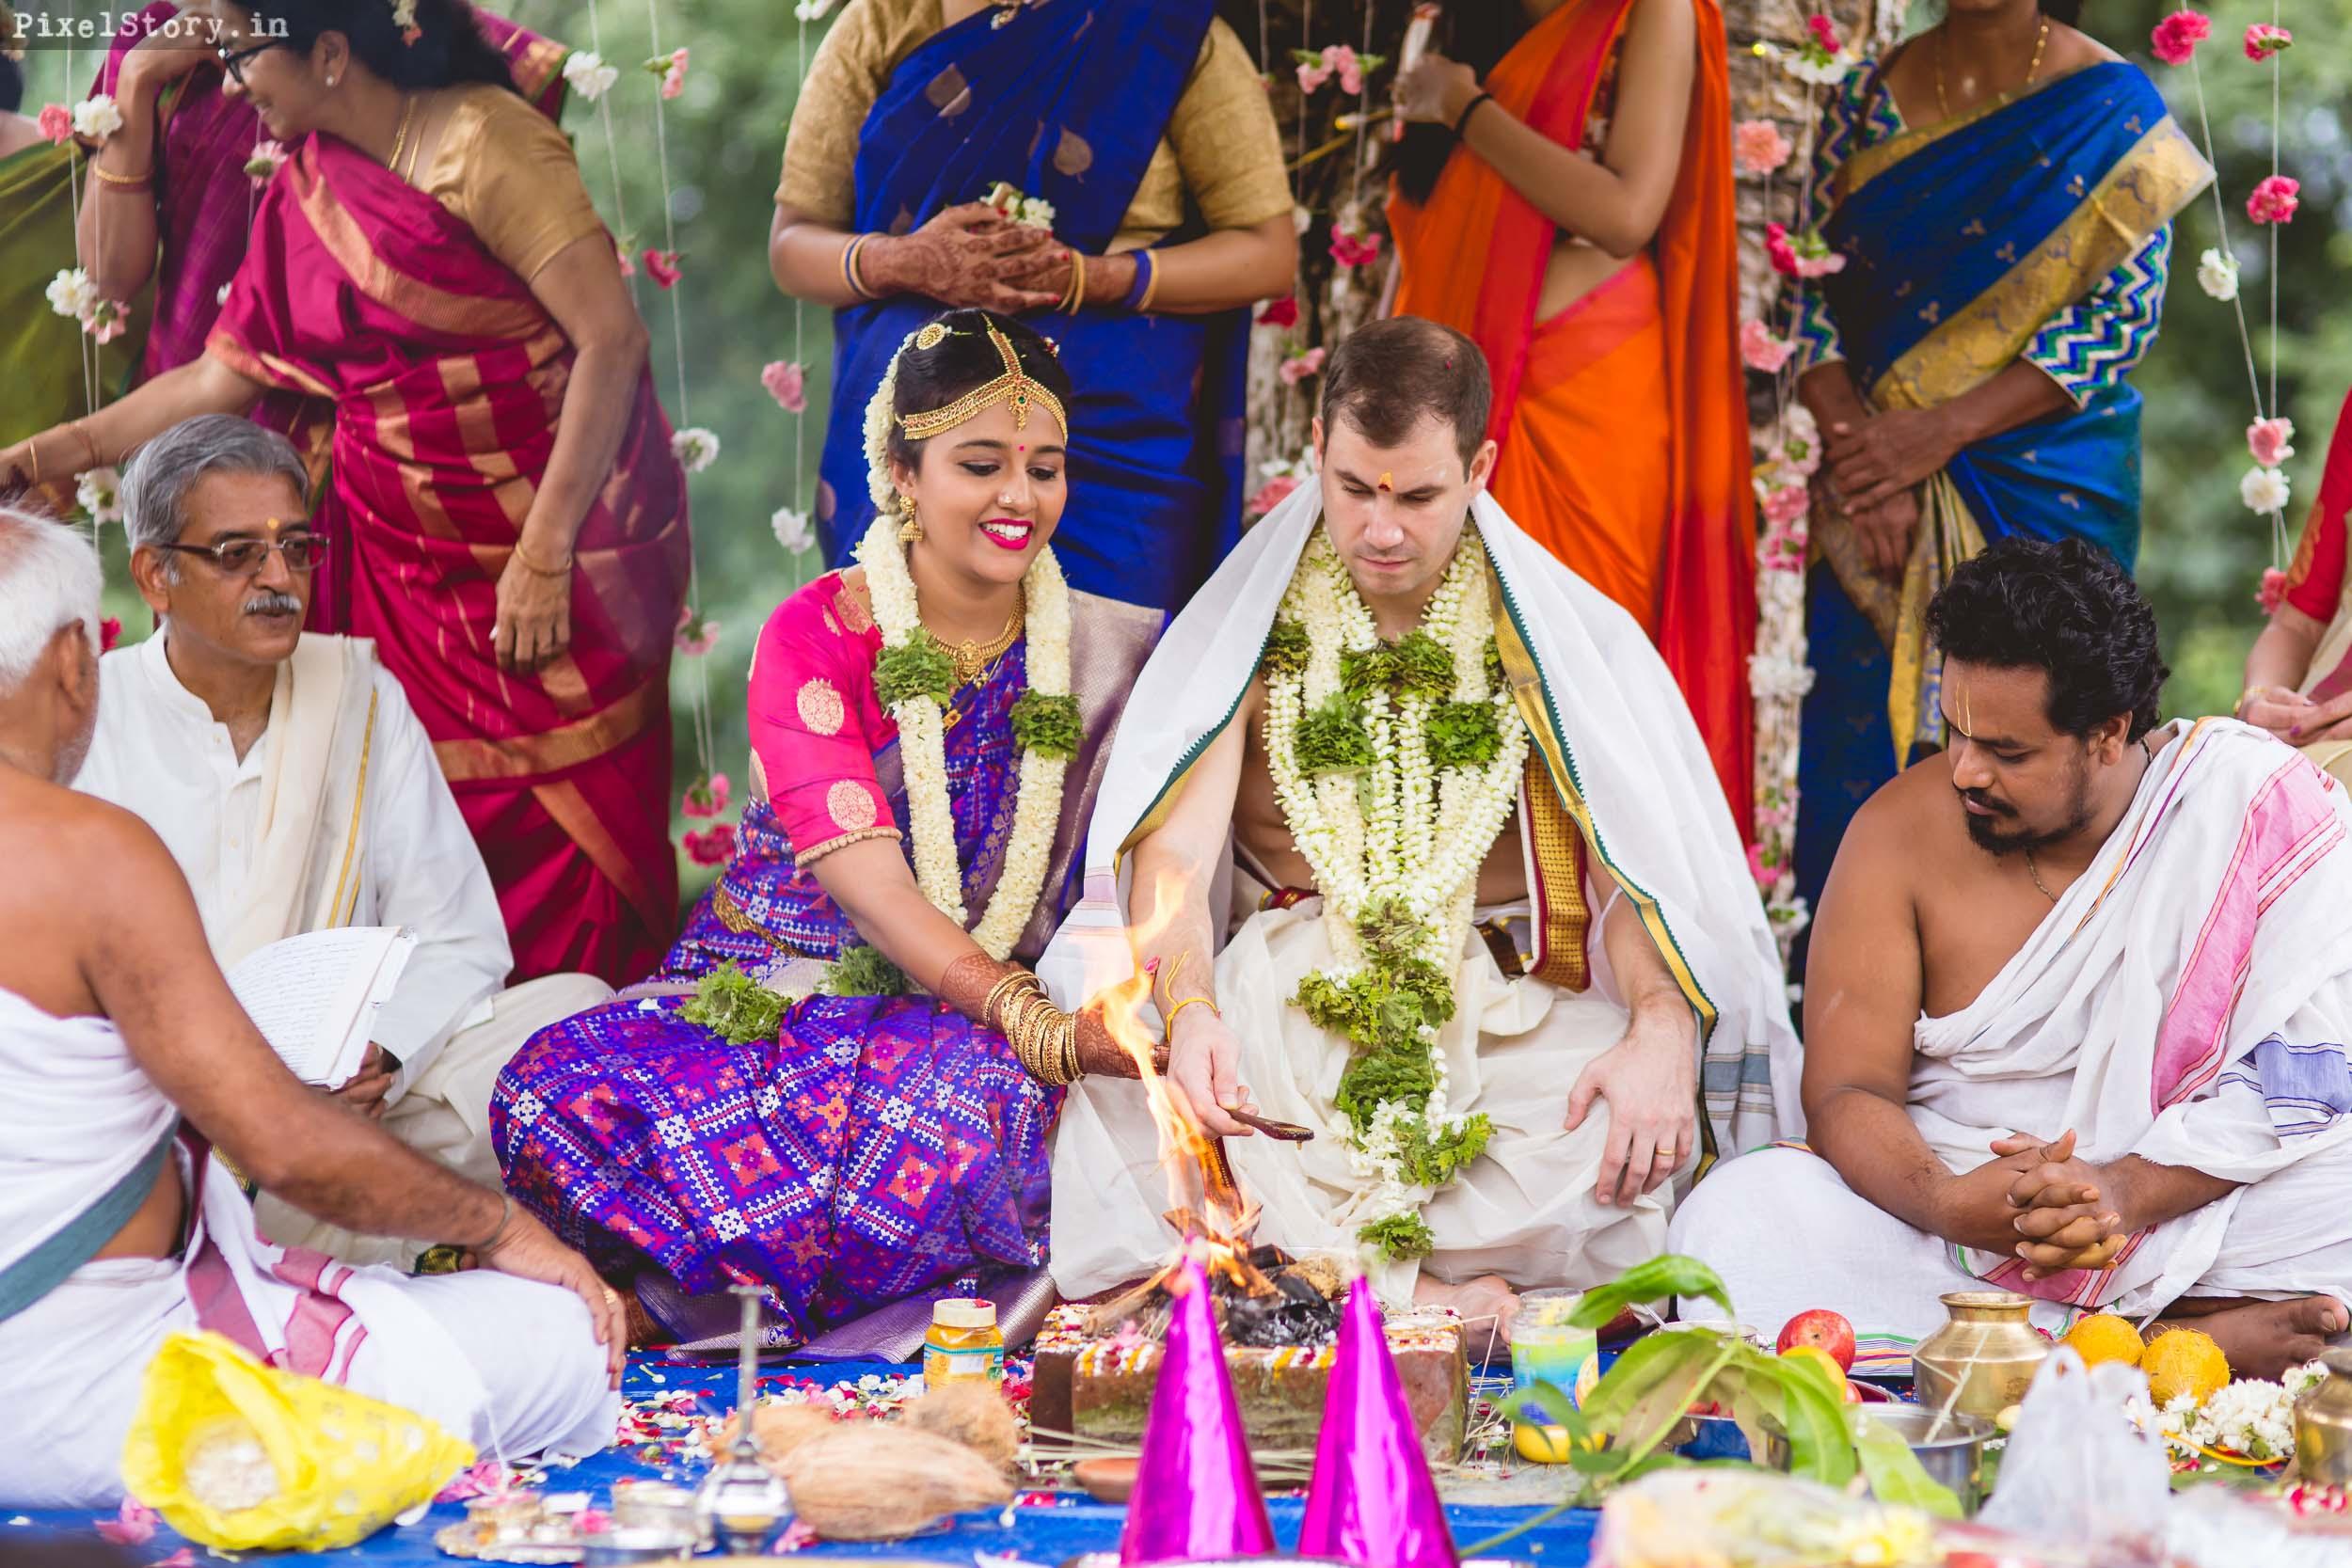 PixelStory-Jungle-Wedding-Photographer-Masinagudi-Indo-French075.jpg